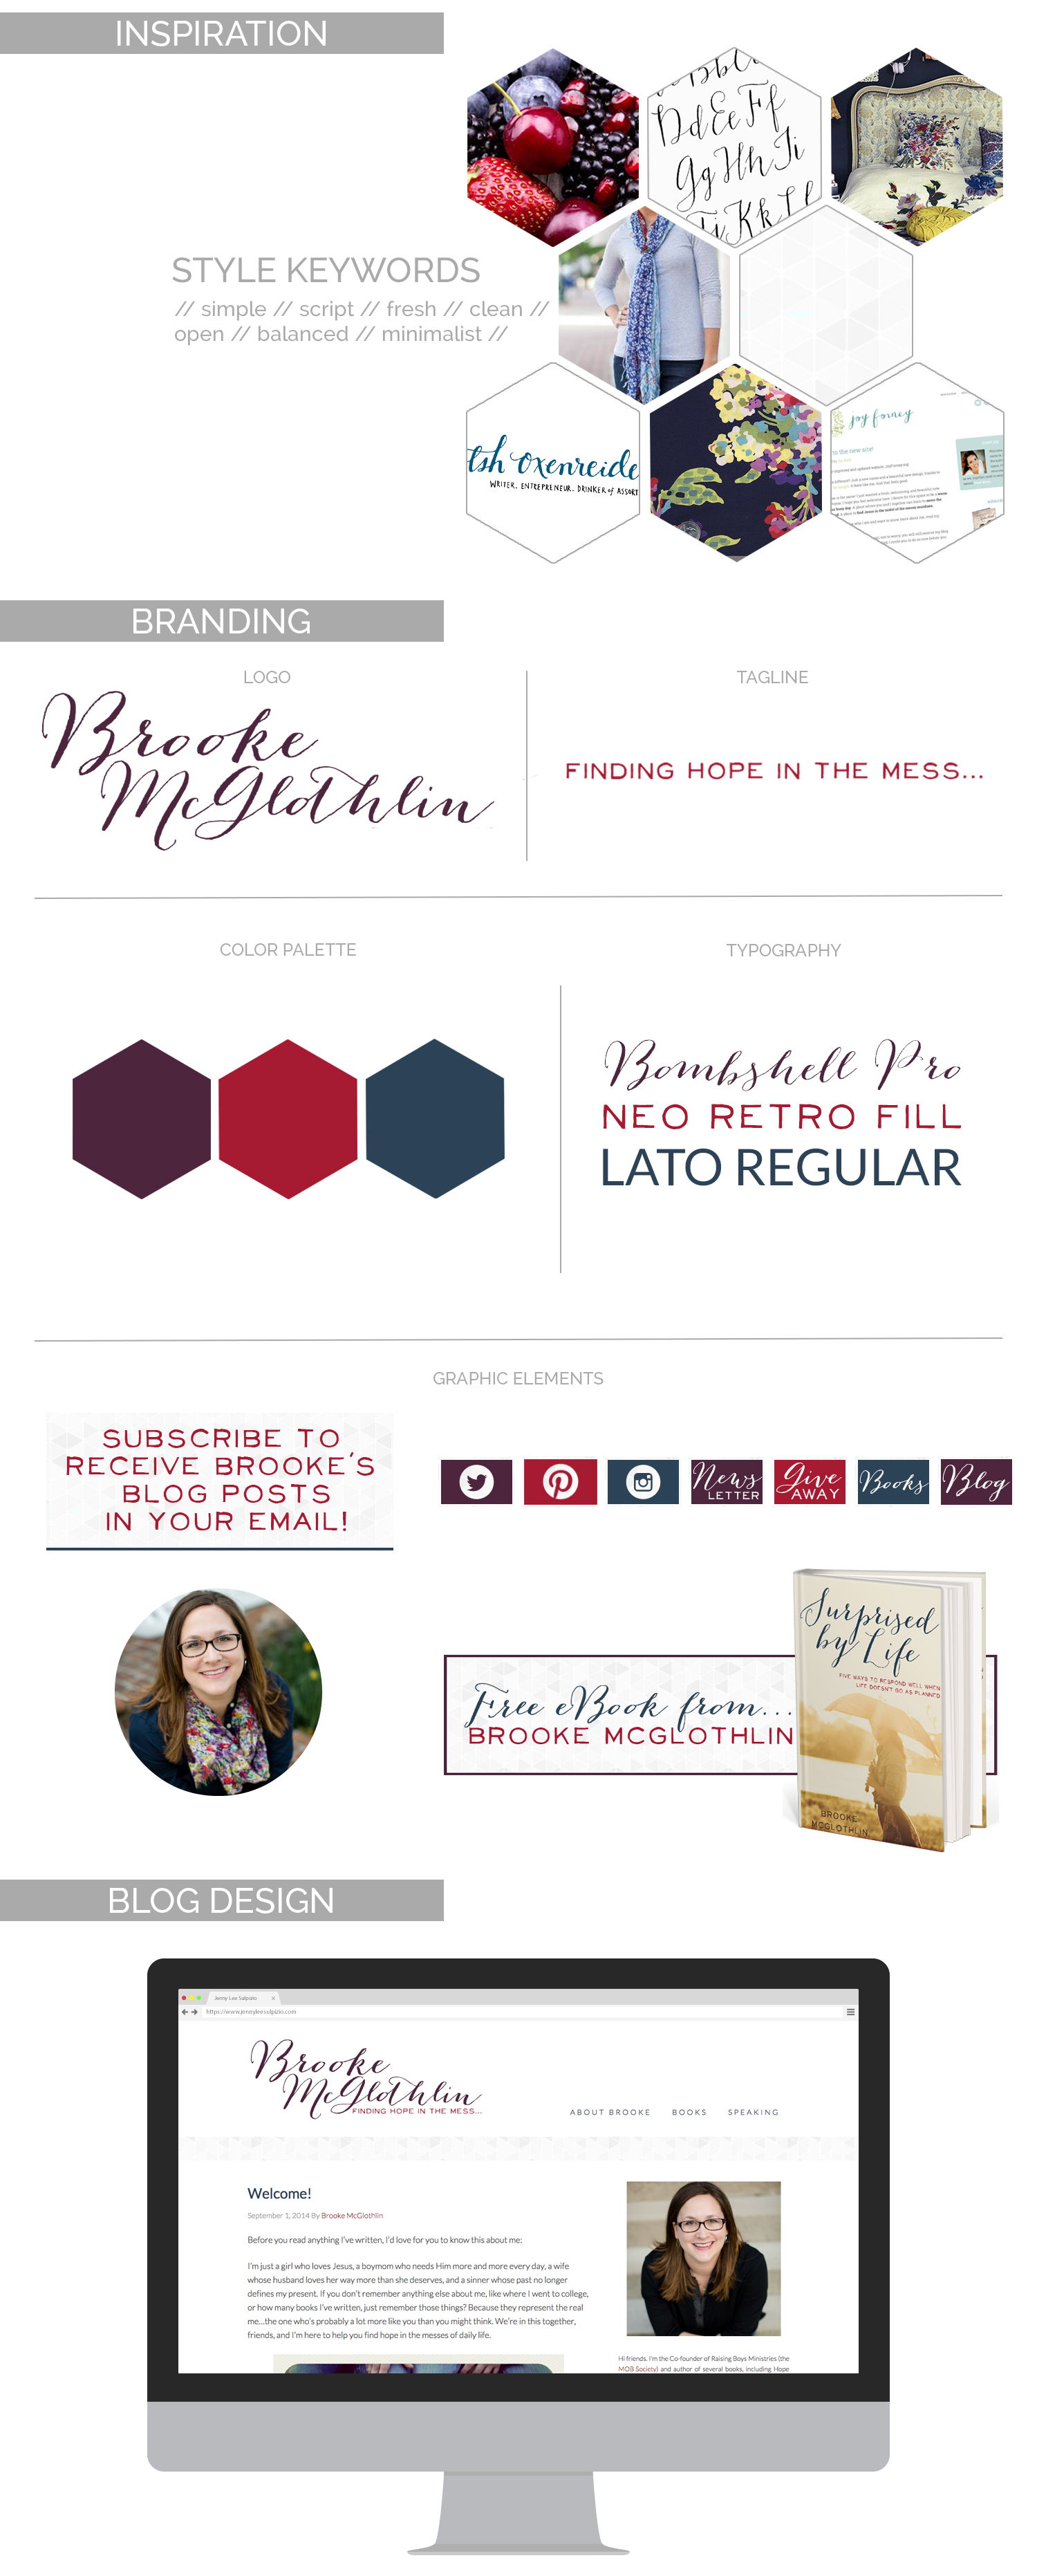 Brooke McGlothlin | Branding and Development by Finding Eden Media